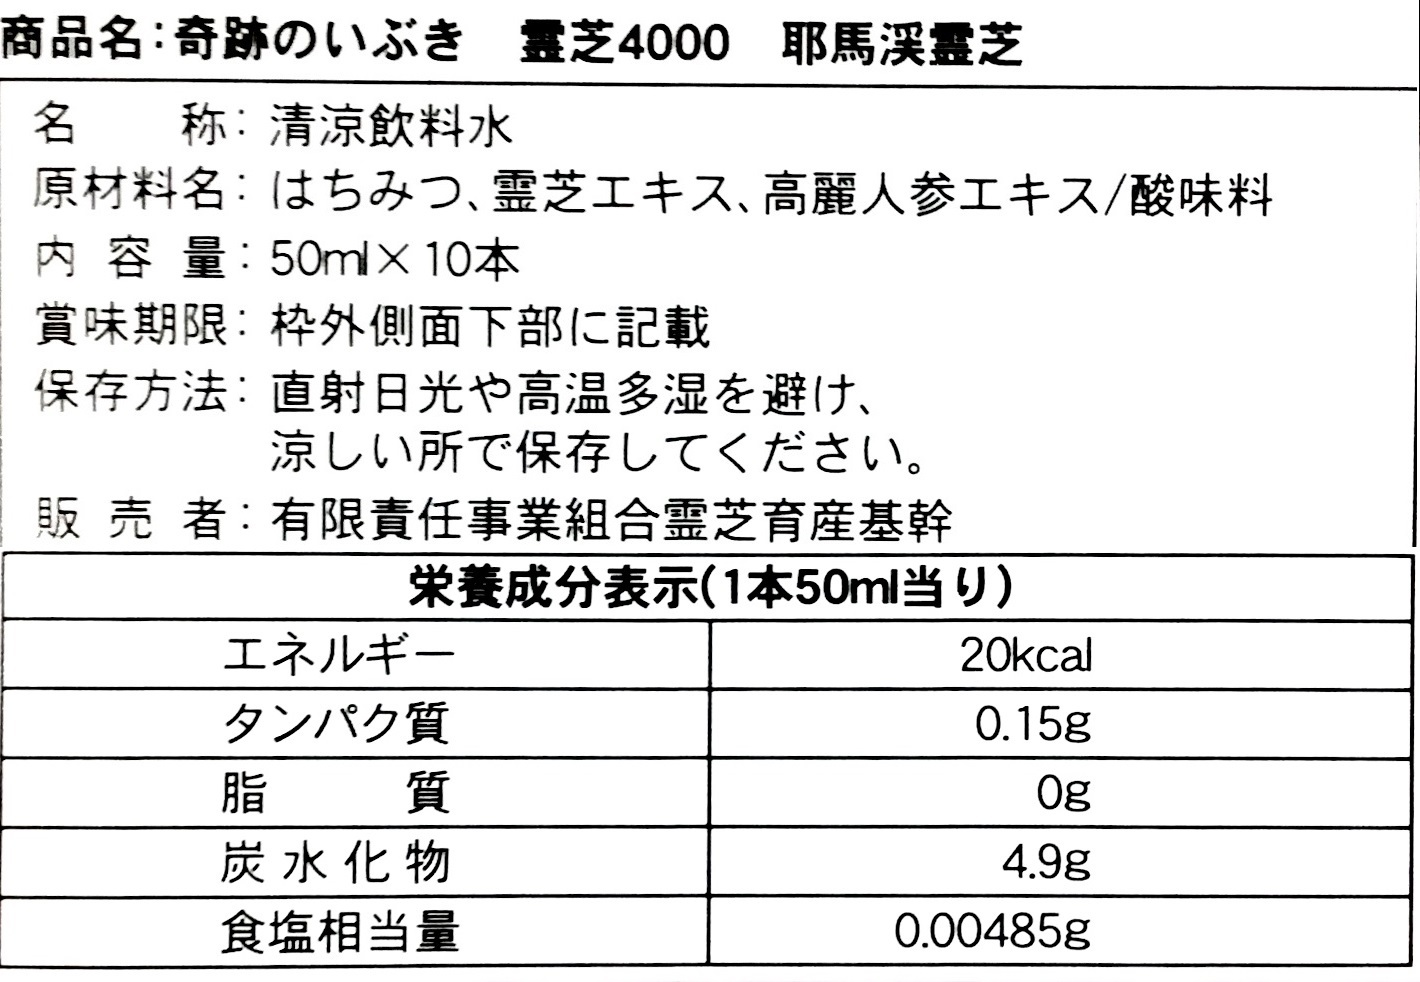 27EE9F17-DEFF-46C5-A9C4-0C4A96AFE0FB - コピー